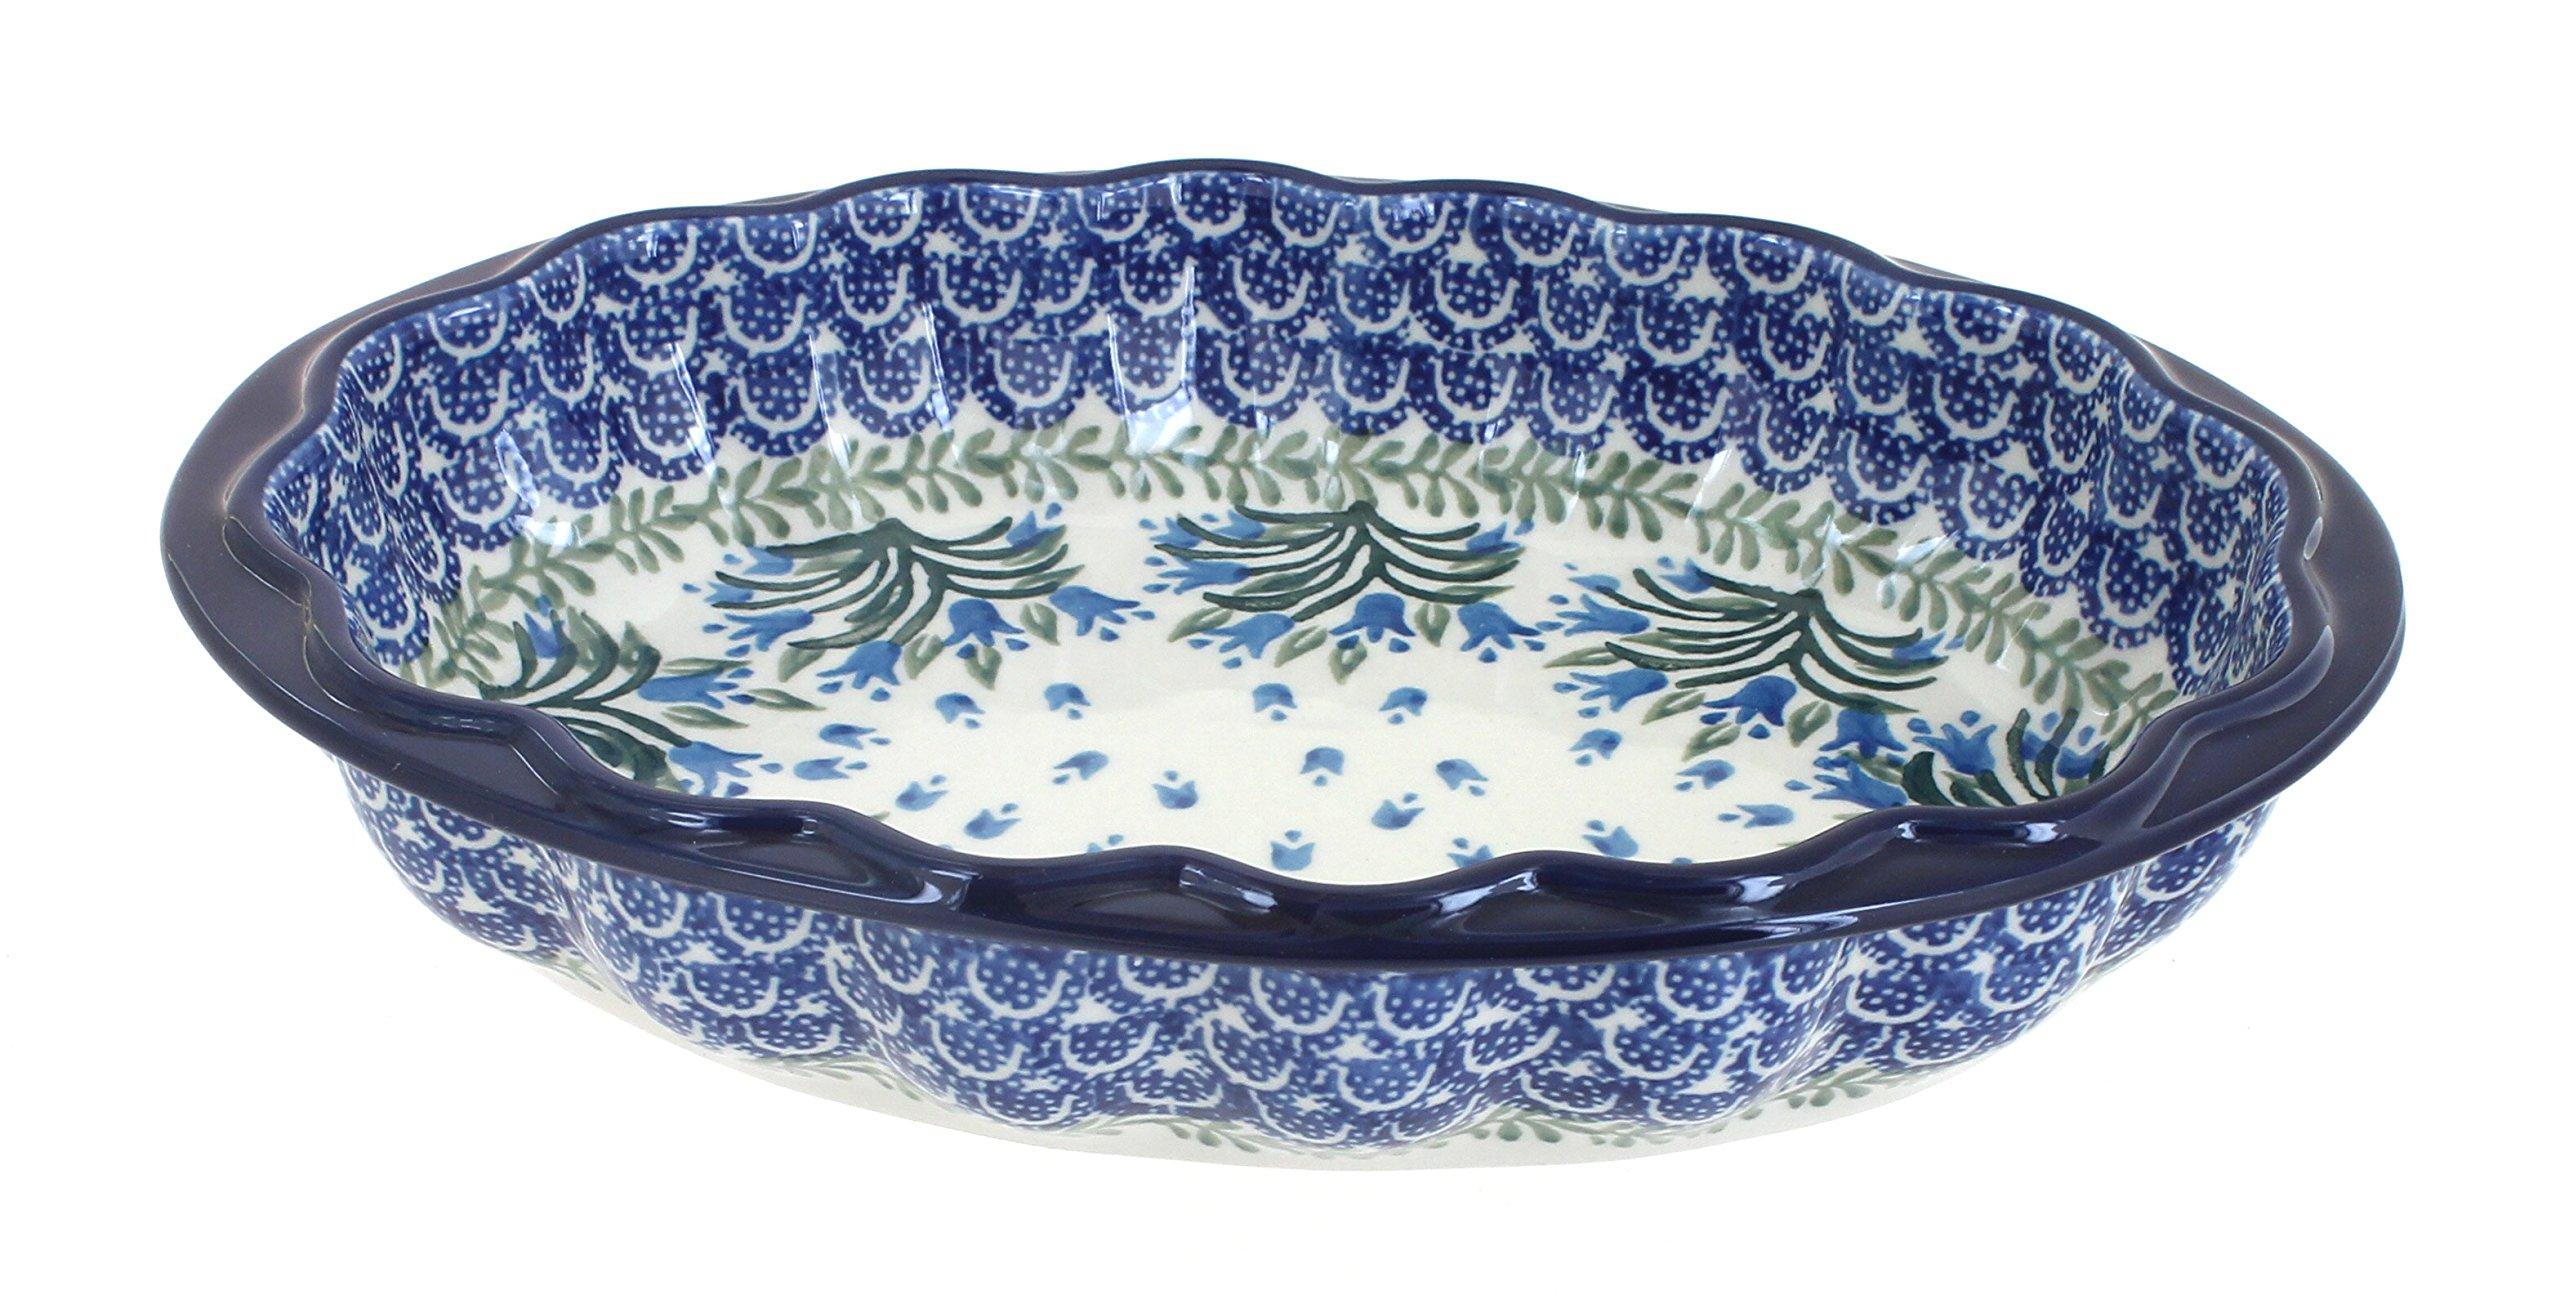 Blue Rose Polish Pottery Tulip Bouquet Scallop Baking Dish